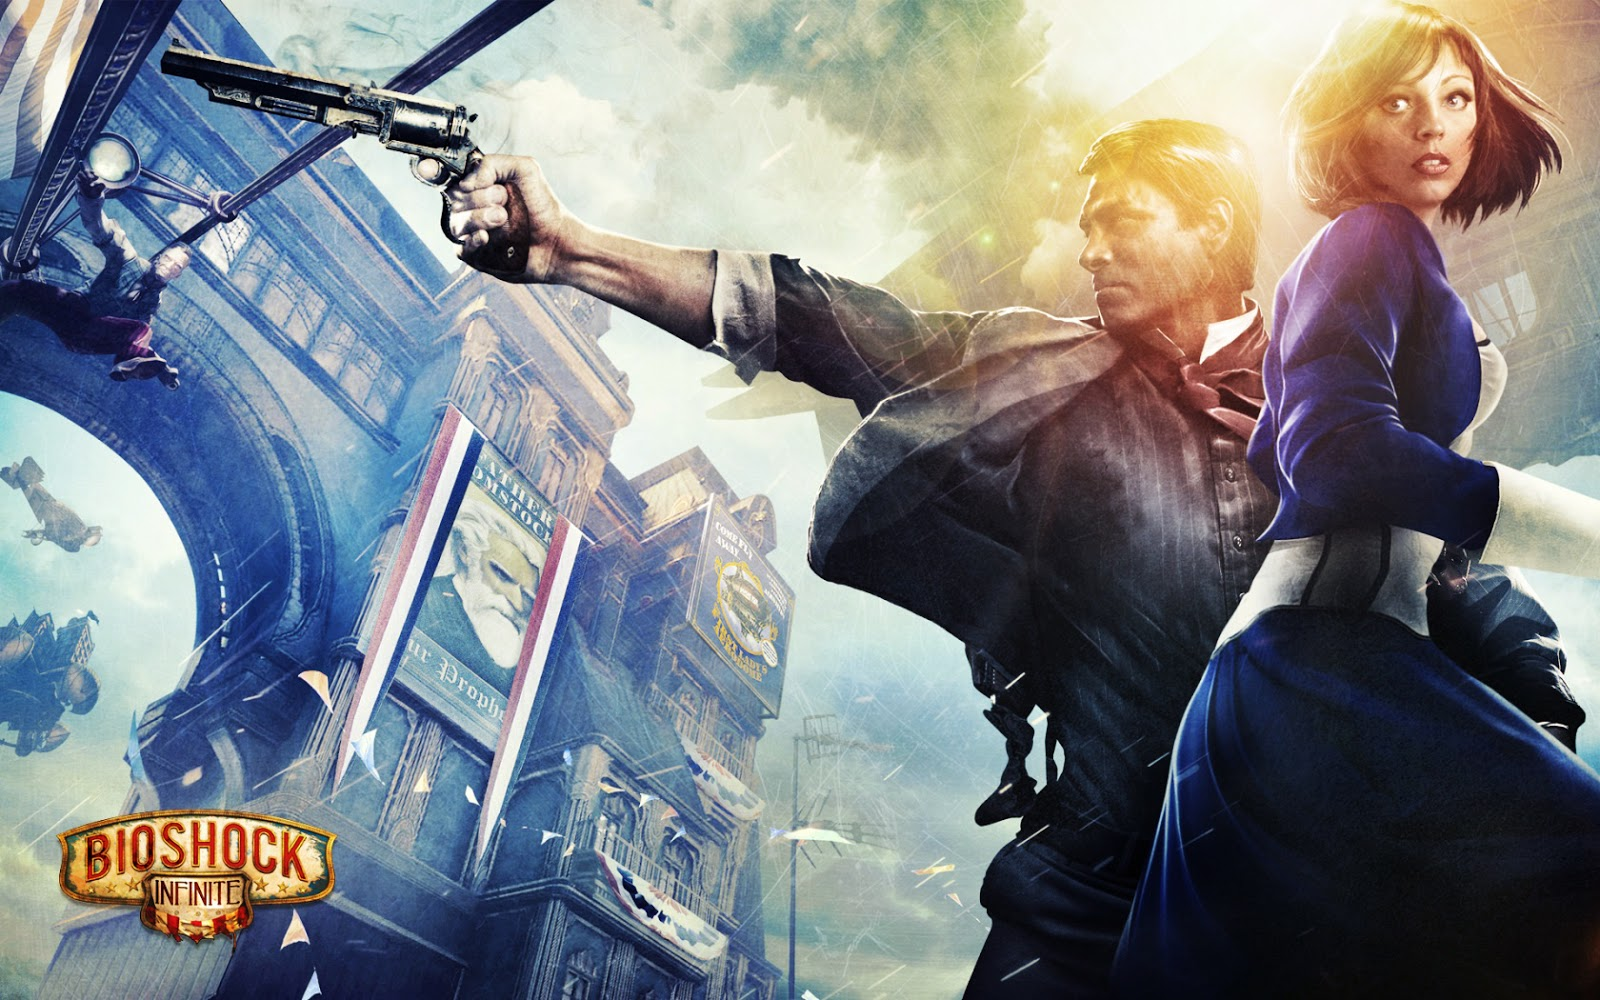 Bioshock Infinite 2013 Game HD Wallpapers HQ Wallpapers - Free Wallpapers Free HQ Wallpaper - HD ...